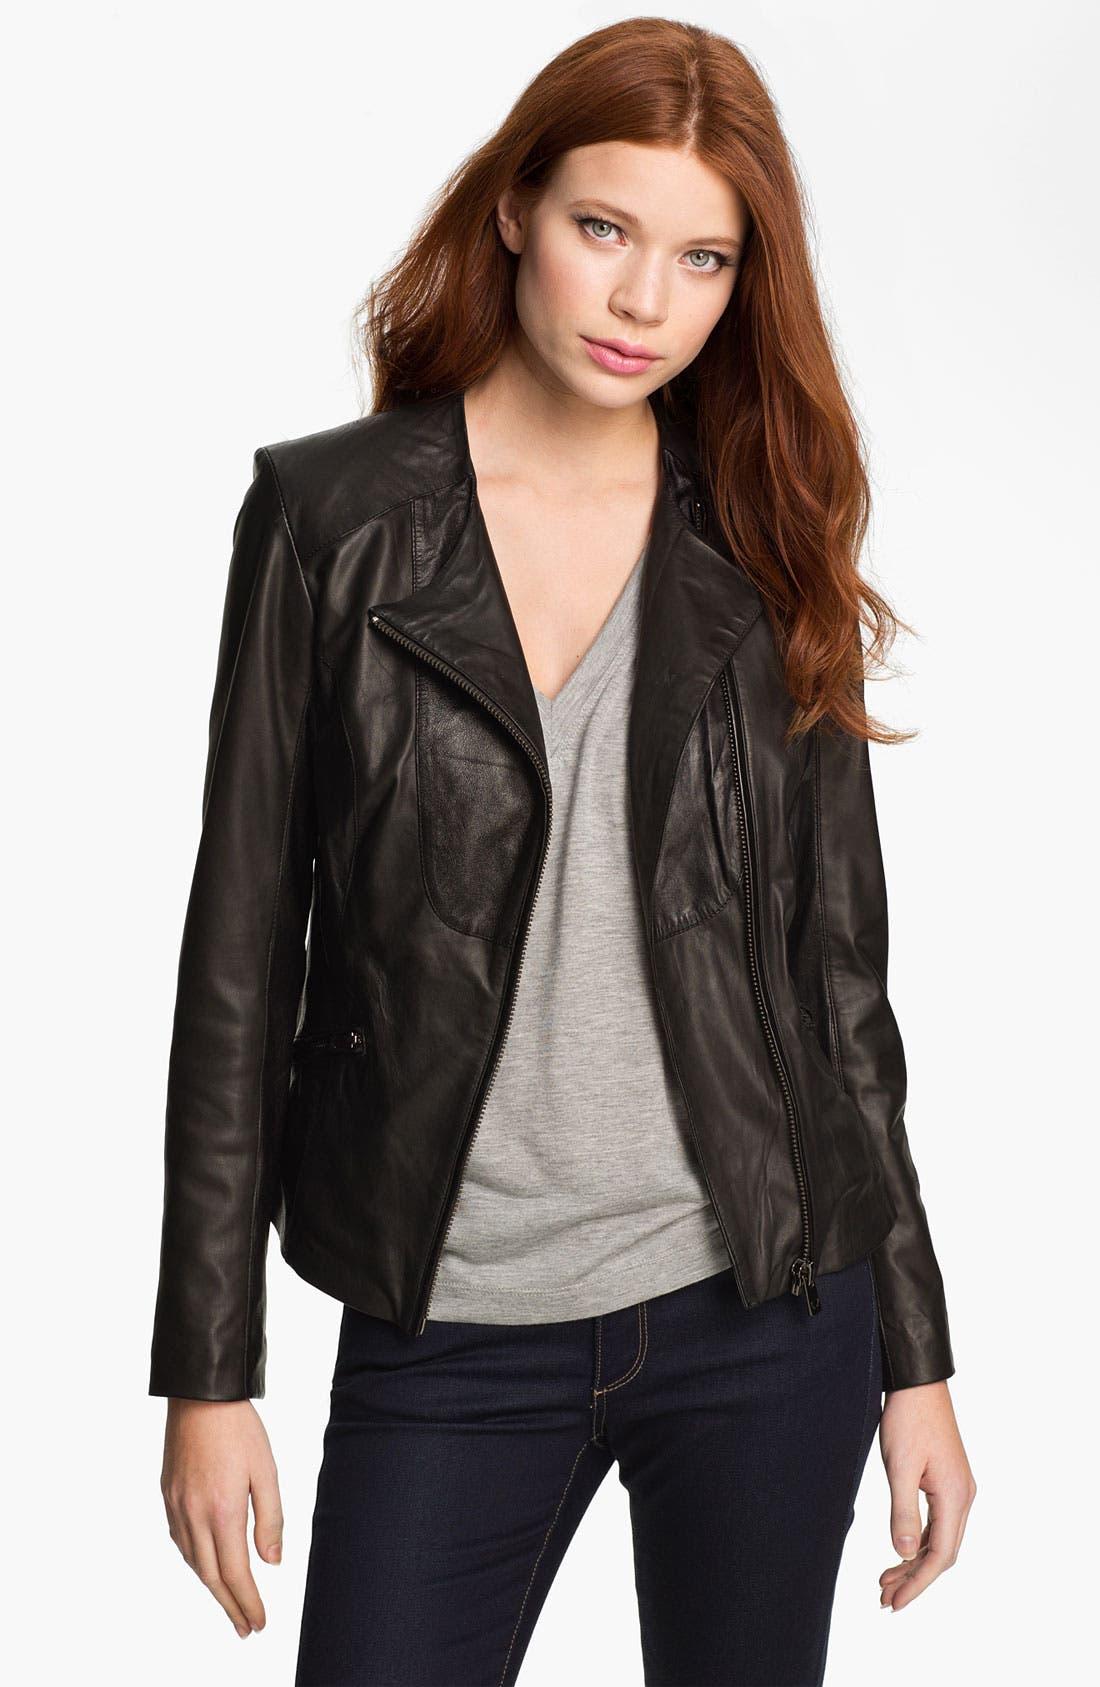 Alternate Image 1 Selected - Bod & Christensen Leather Moto Jacket (Online Exclusive)